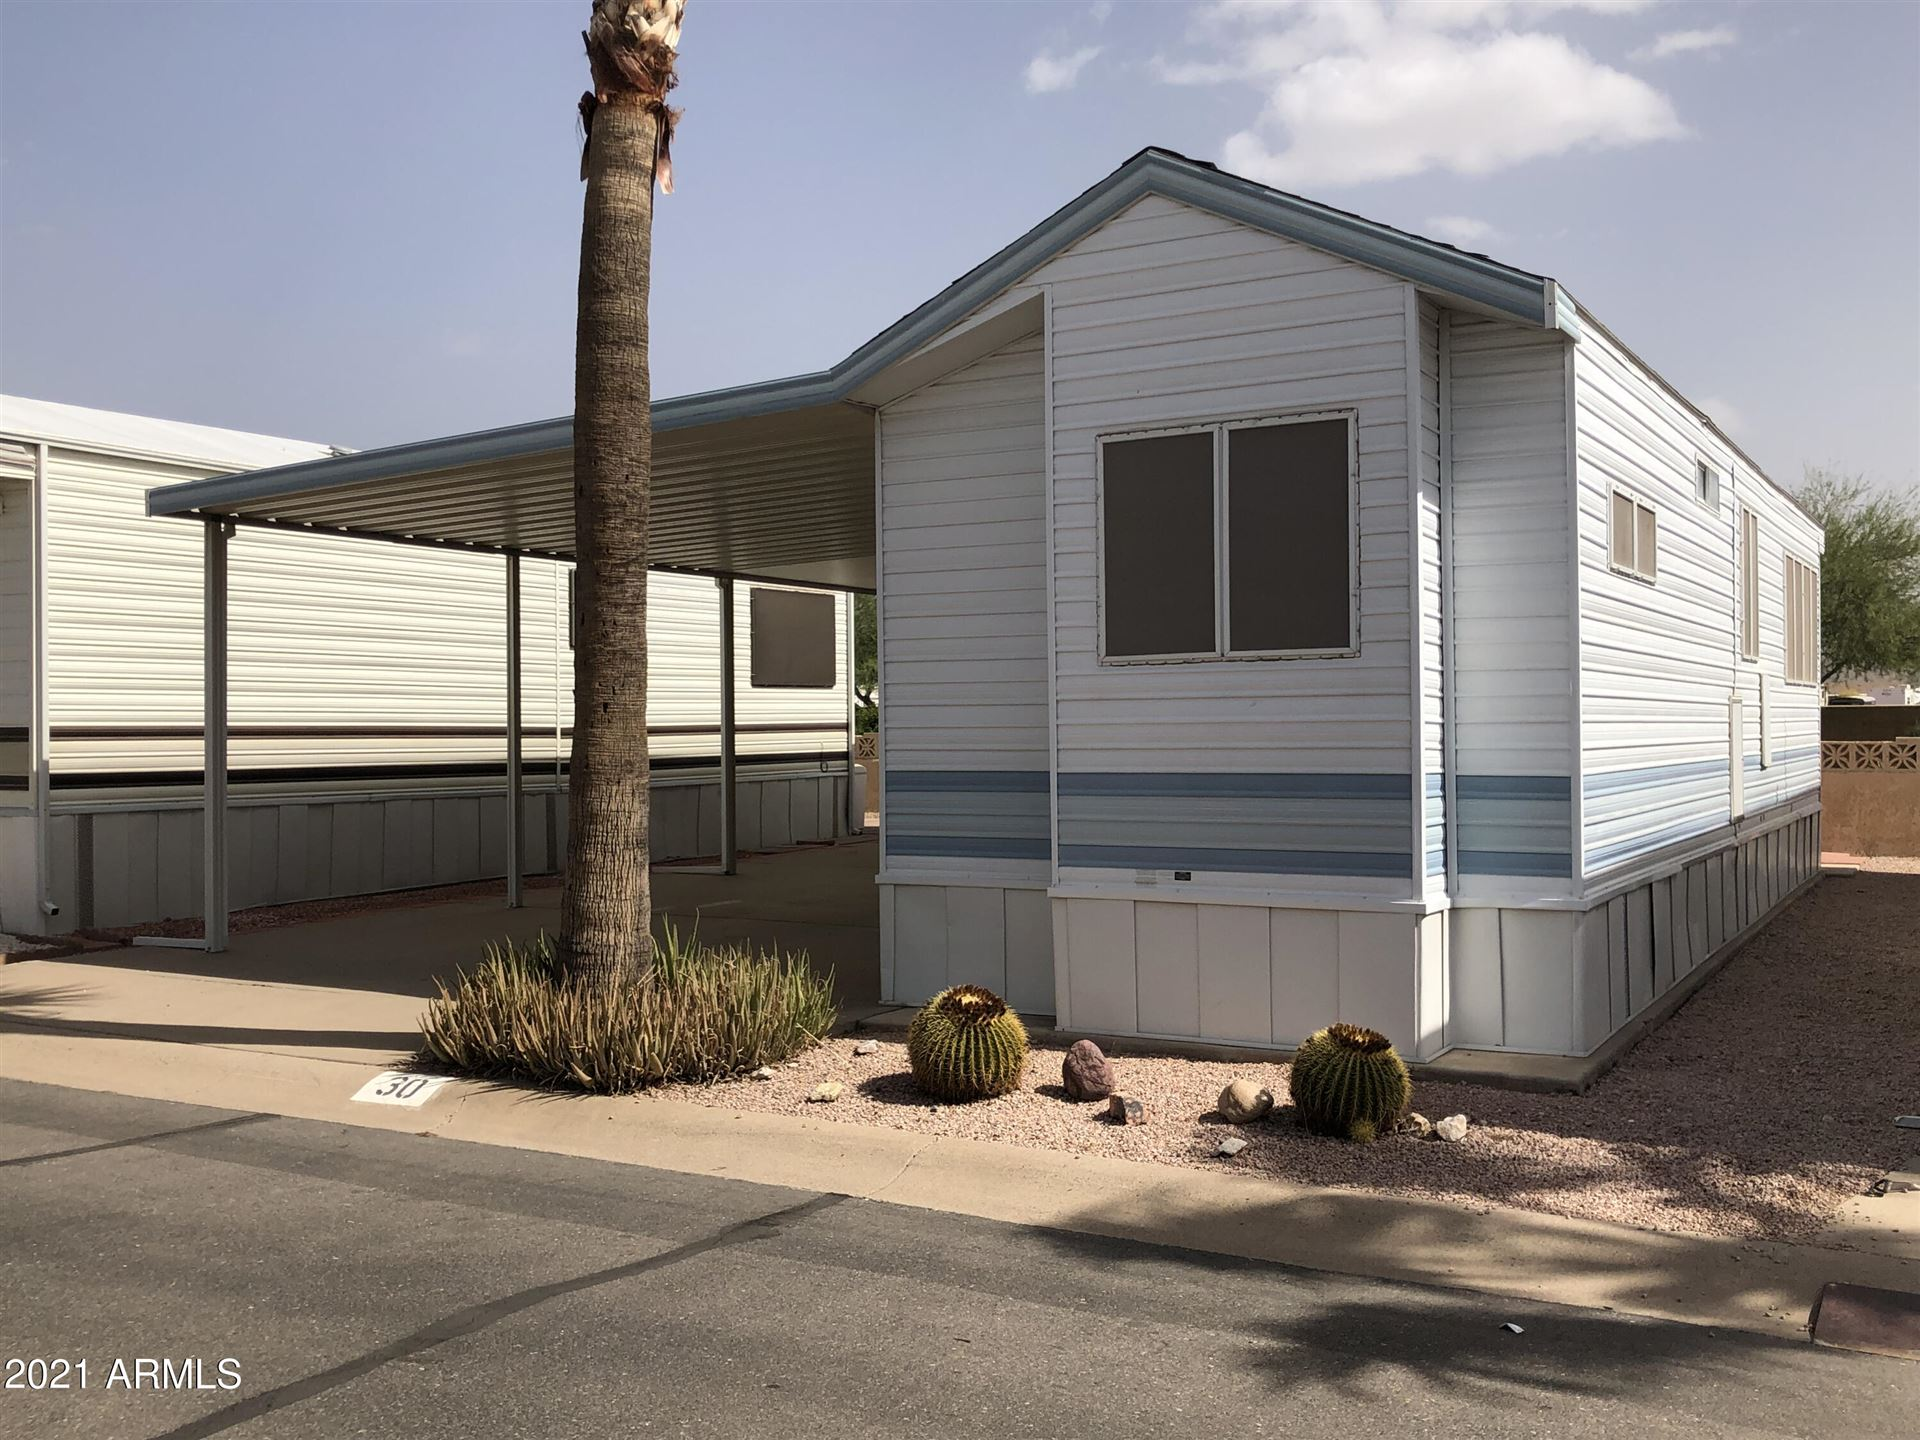 Photo of 30 S IRON ORE Drive, Apache Junction, AZ 85119 (MLS # 6306154)